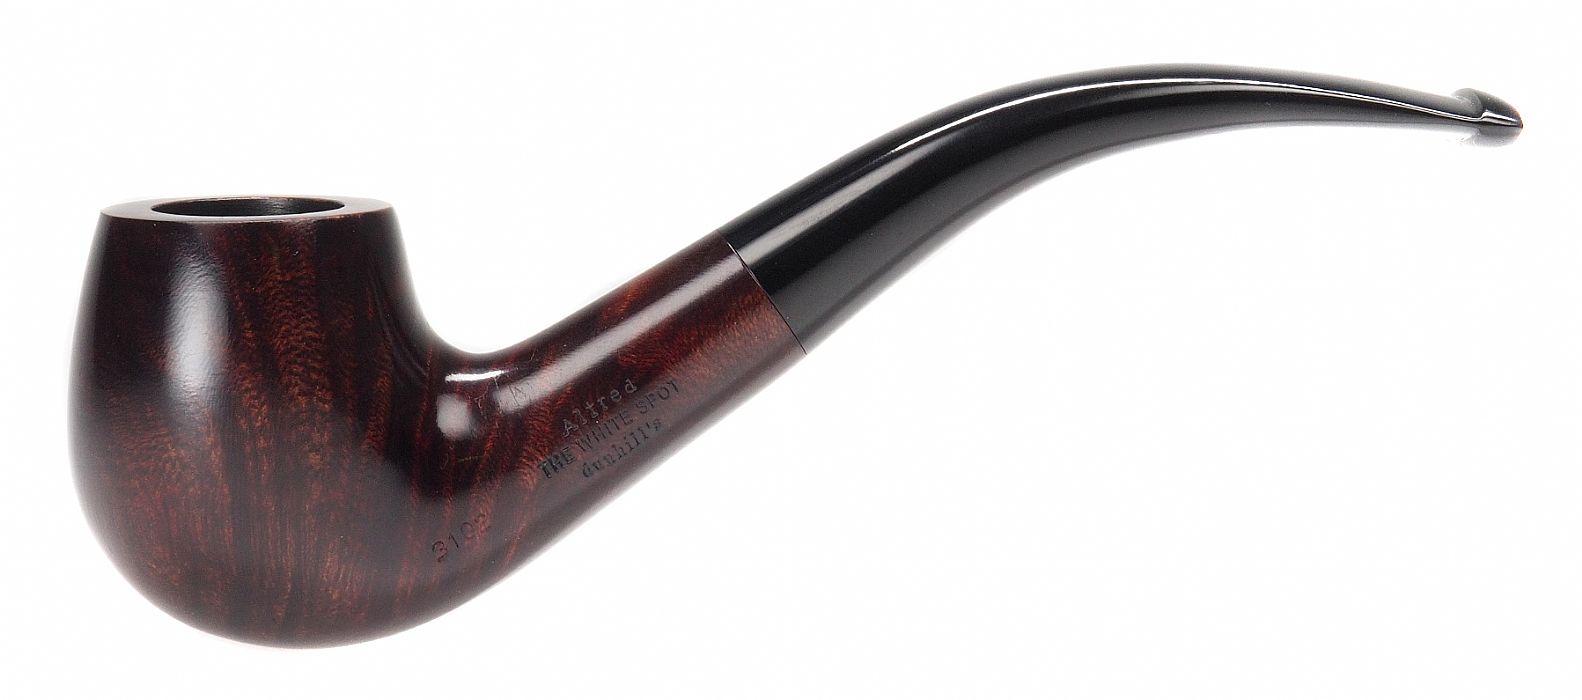 Dunhill, Bruyere 3102, Bent Billard - Dunhill - The Danish Pipe Shop